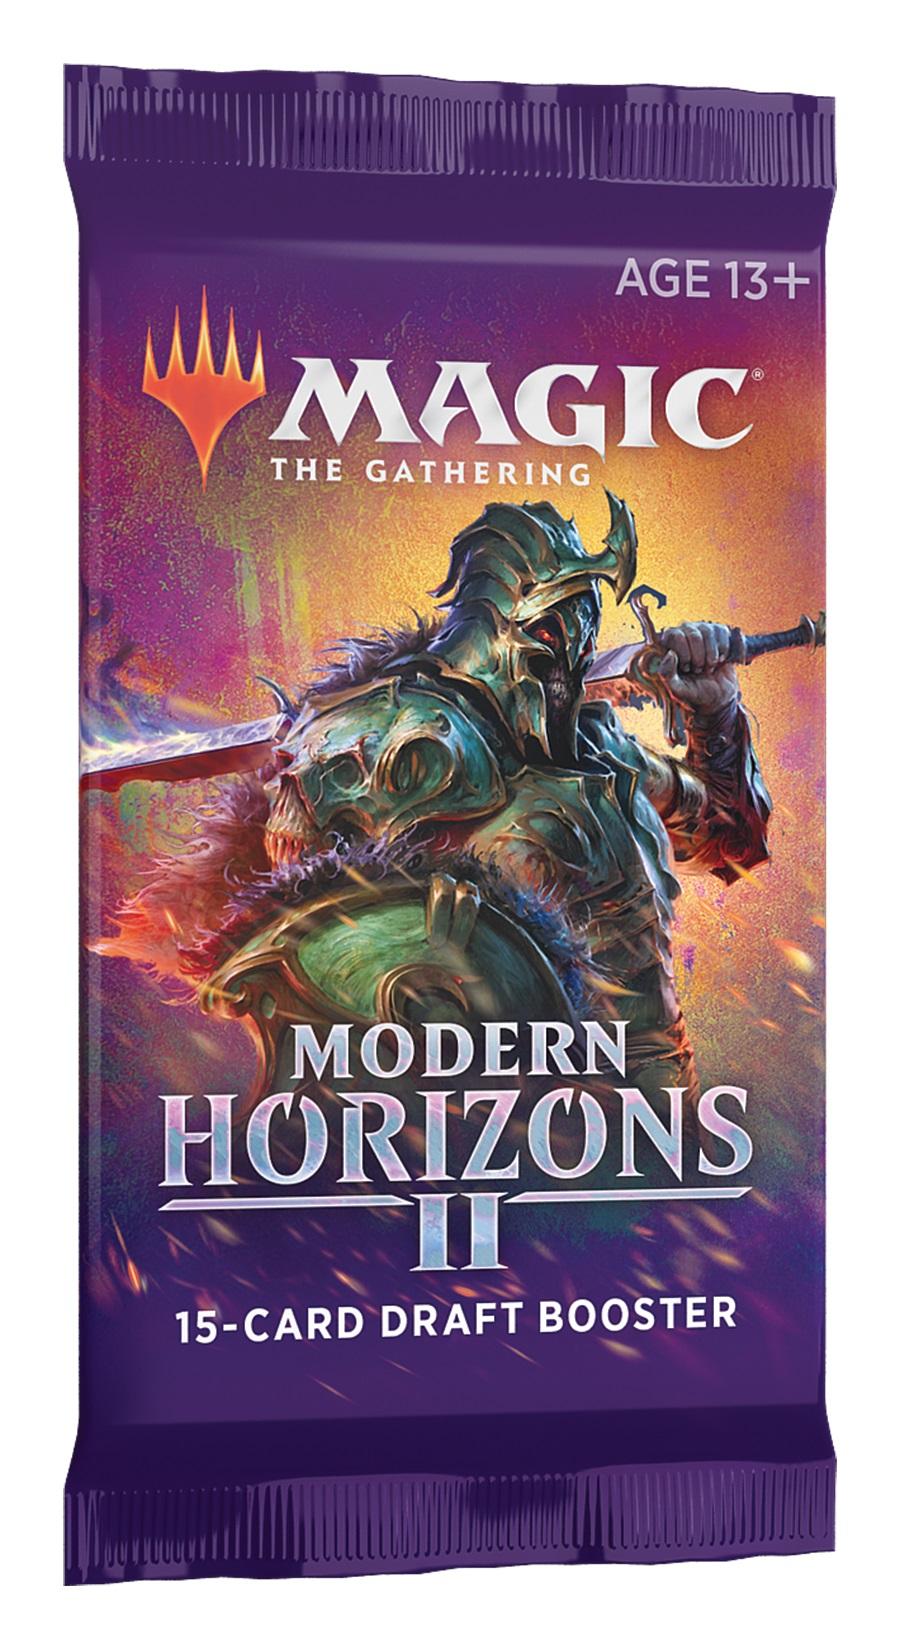 Modern Horizons 2 Draft Booster Pack